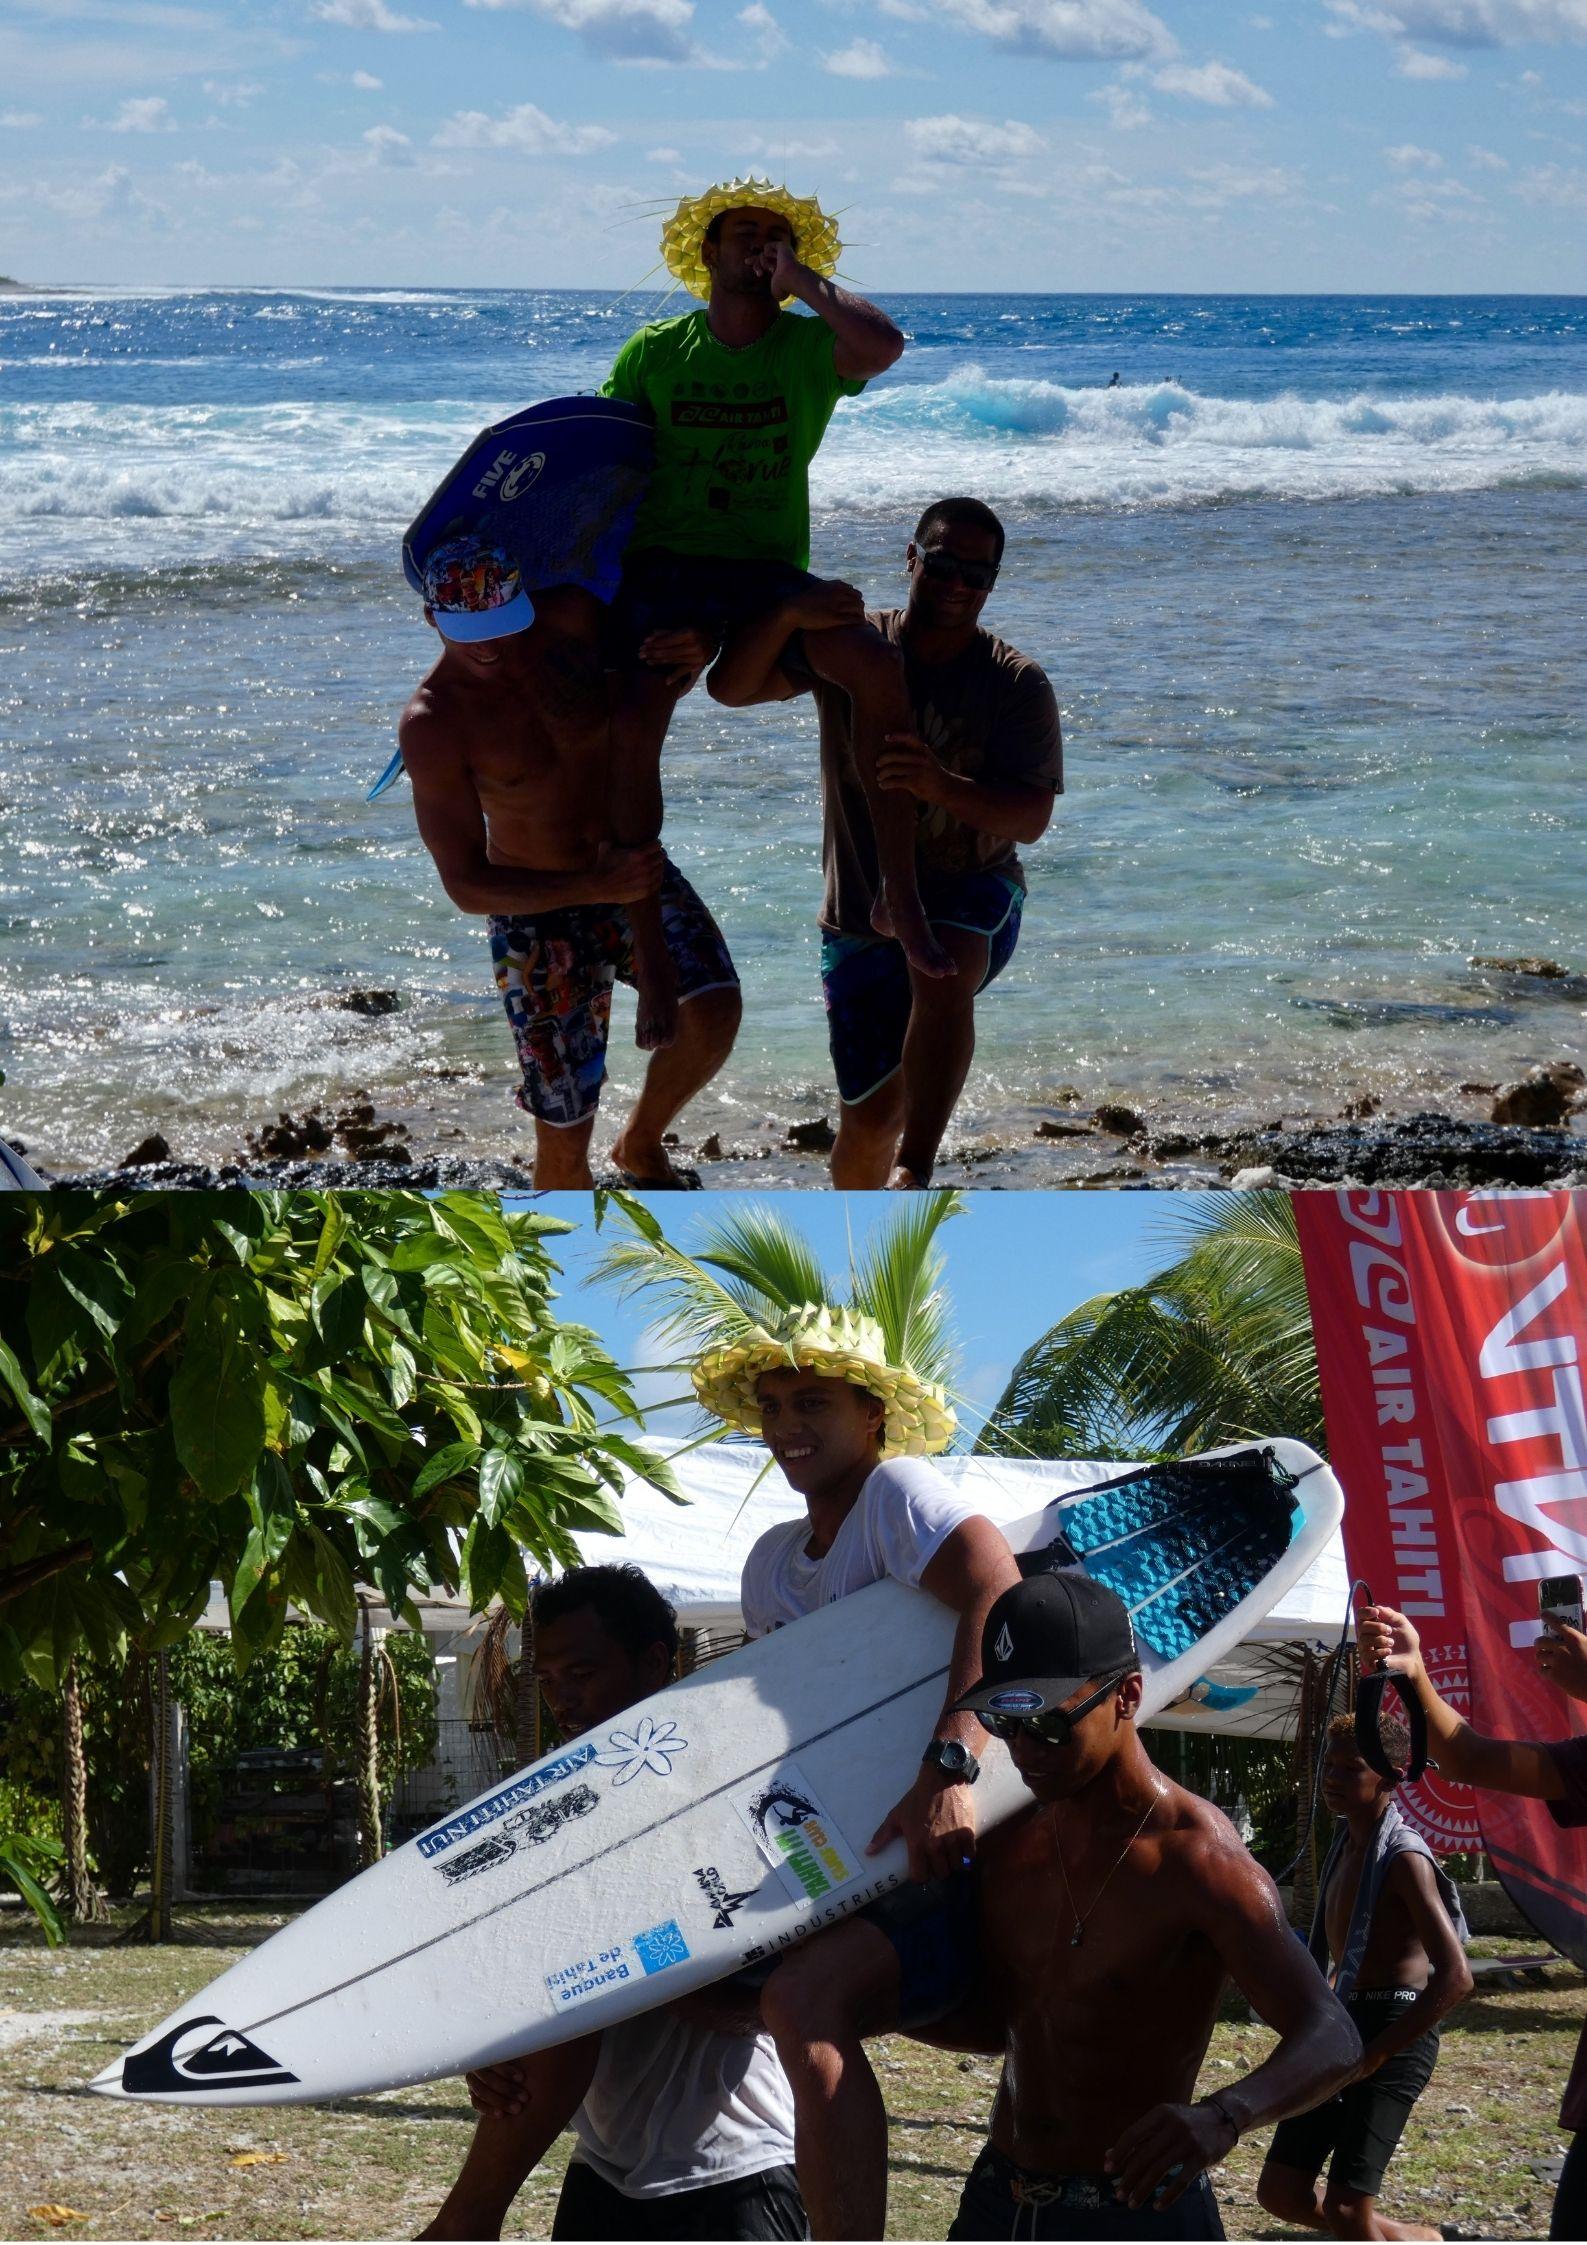 James OMITAI et Kauli VAAST – Grands vainqueurs de la Air Tahiti Rairoa Horue 2021